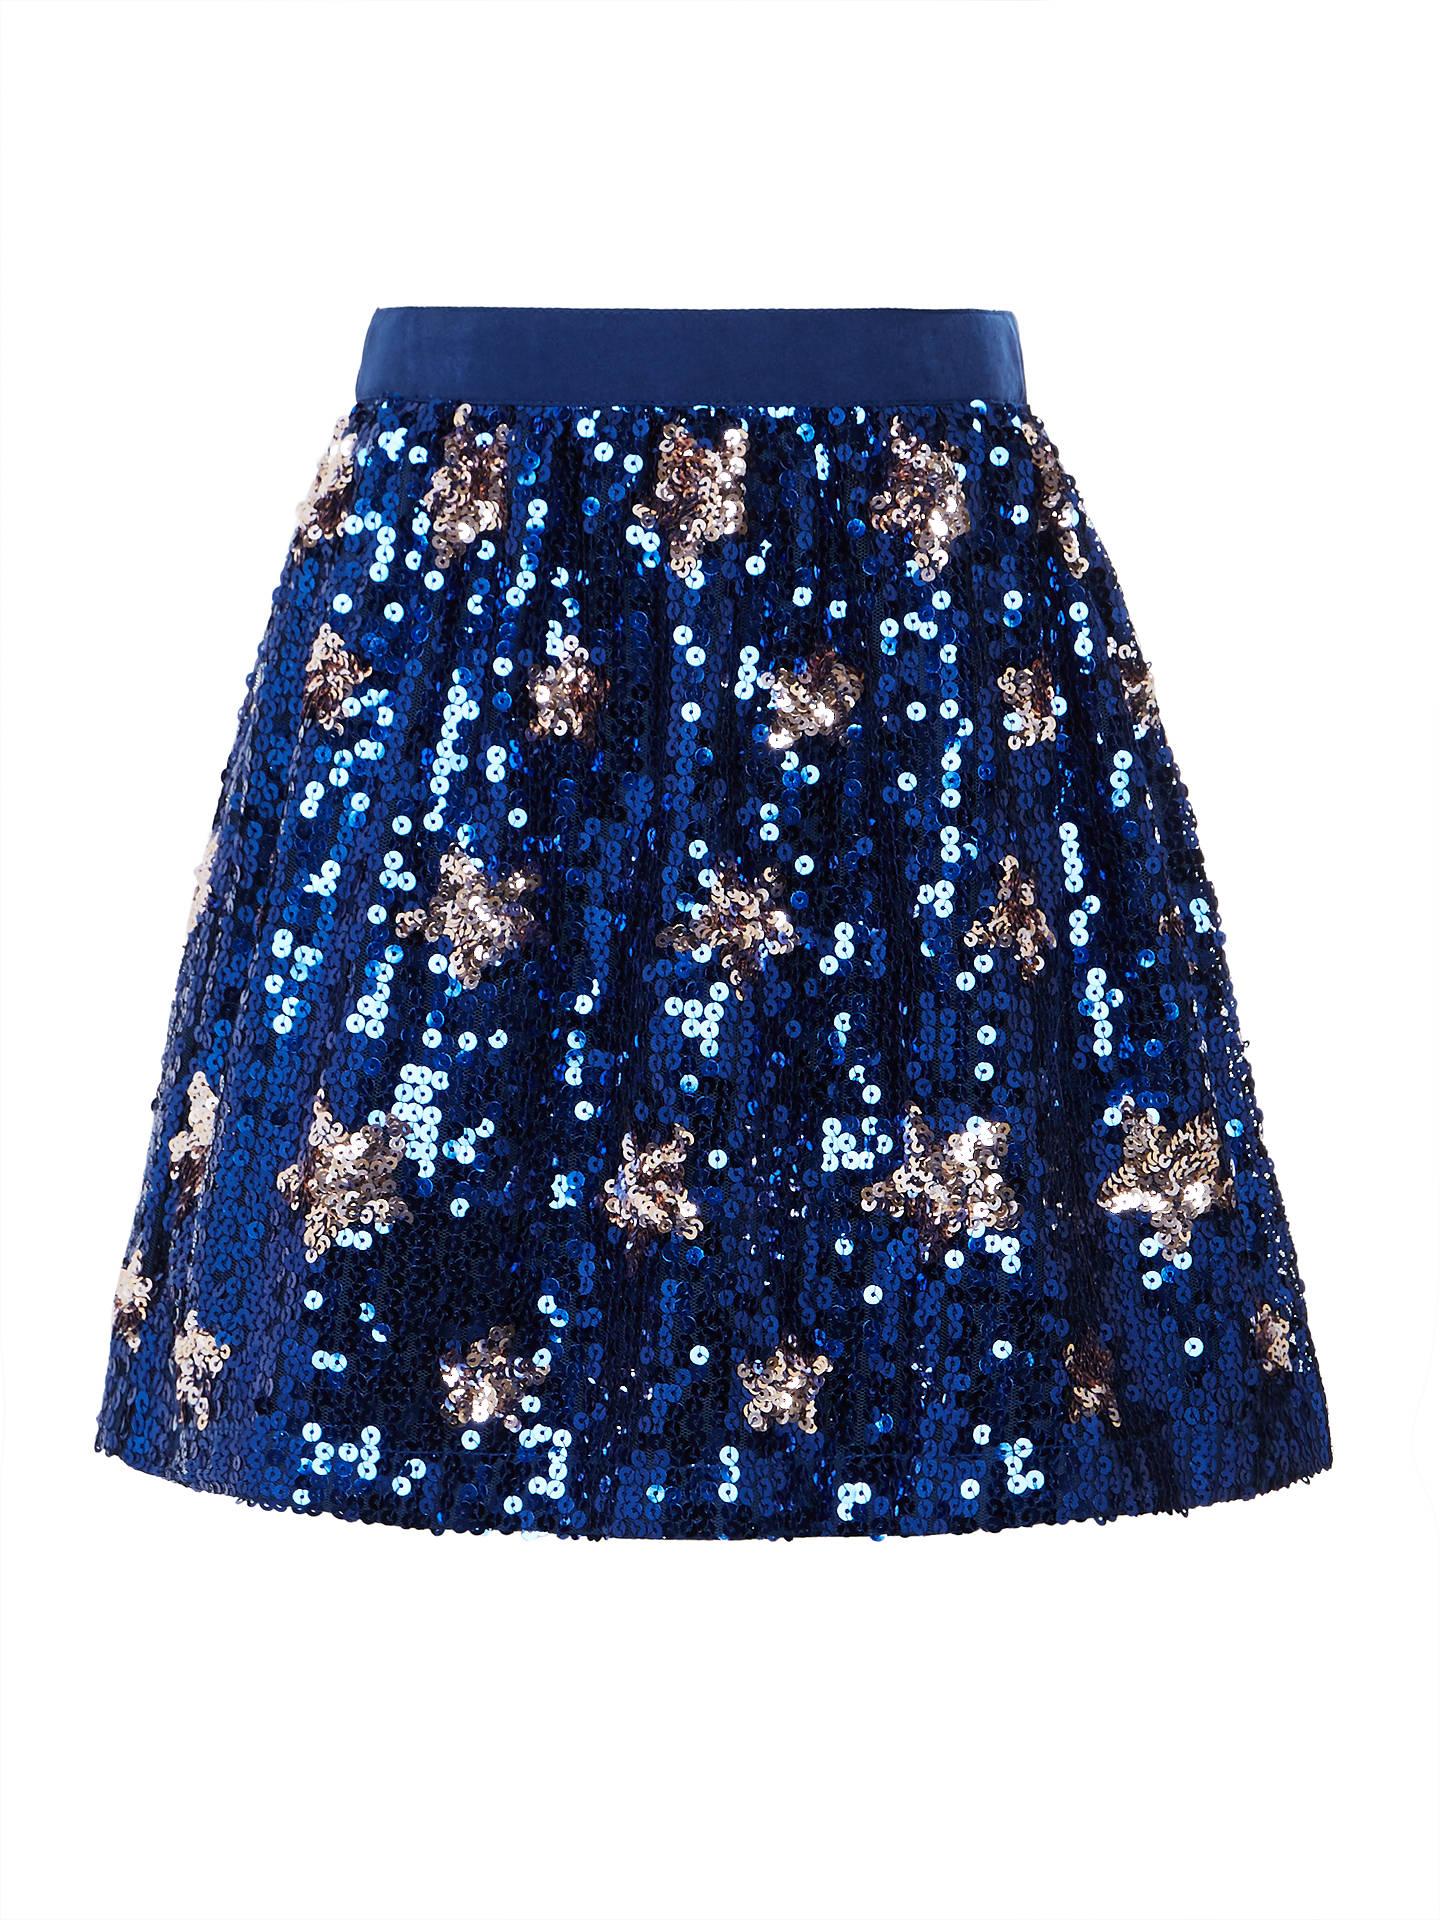 de8bebe2a9 Buy John Lewis Girls' Sequin Star Skirt, Navy, 3 years Online at johnlewis  ...